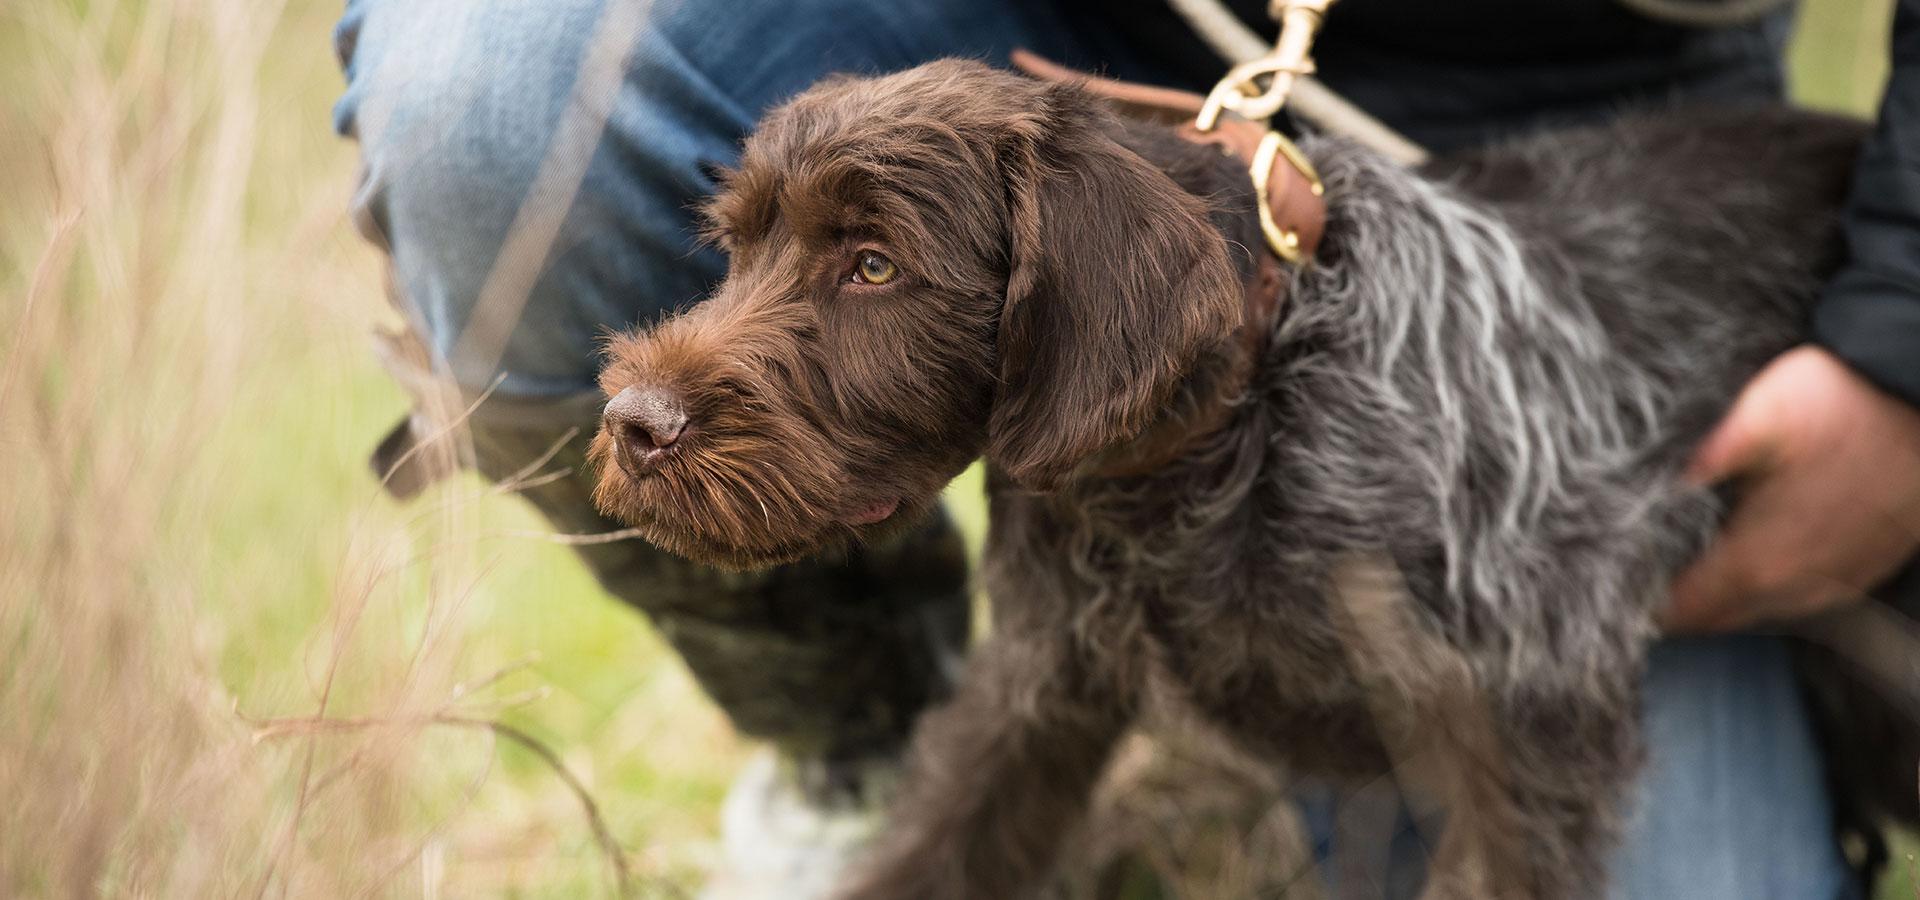 Bird Dog Training, Training Seminars, and Supplies - Ronnie Smith